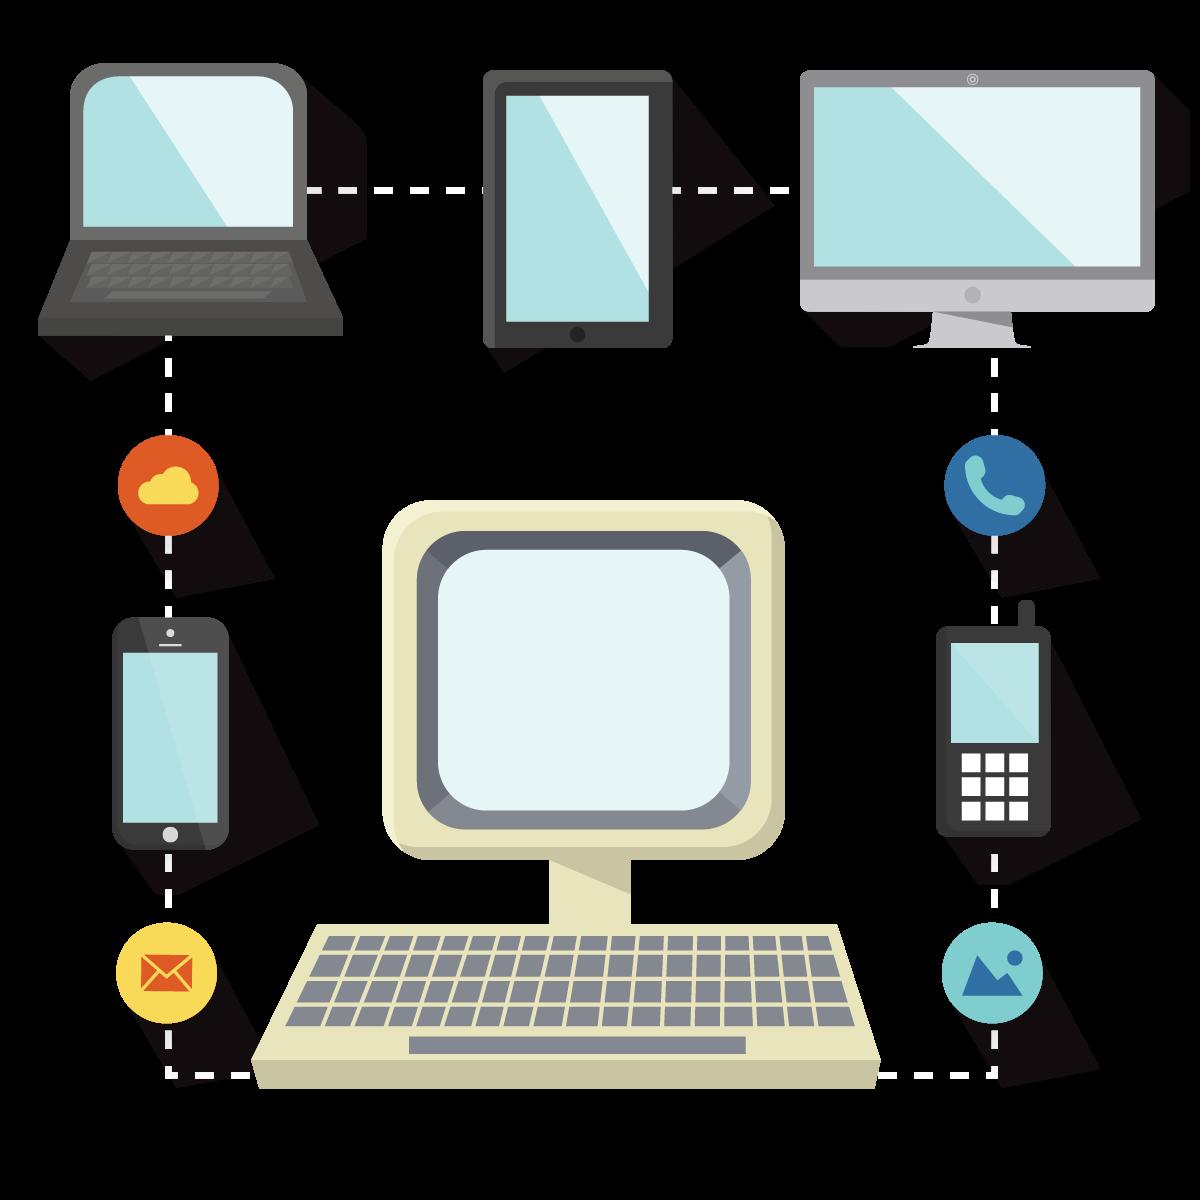 clip art freeuse stock Network cloud computing euclidean. Vector computer networking